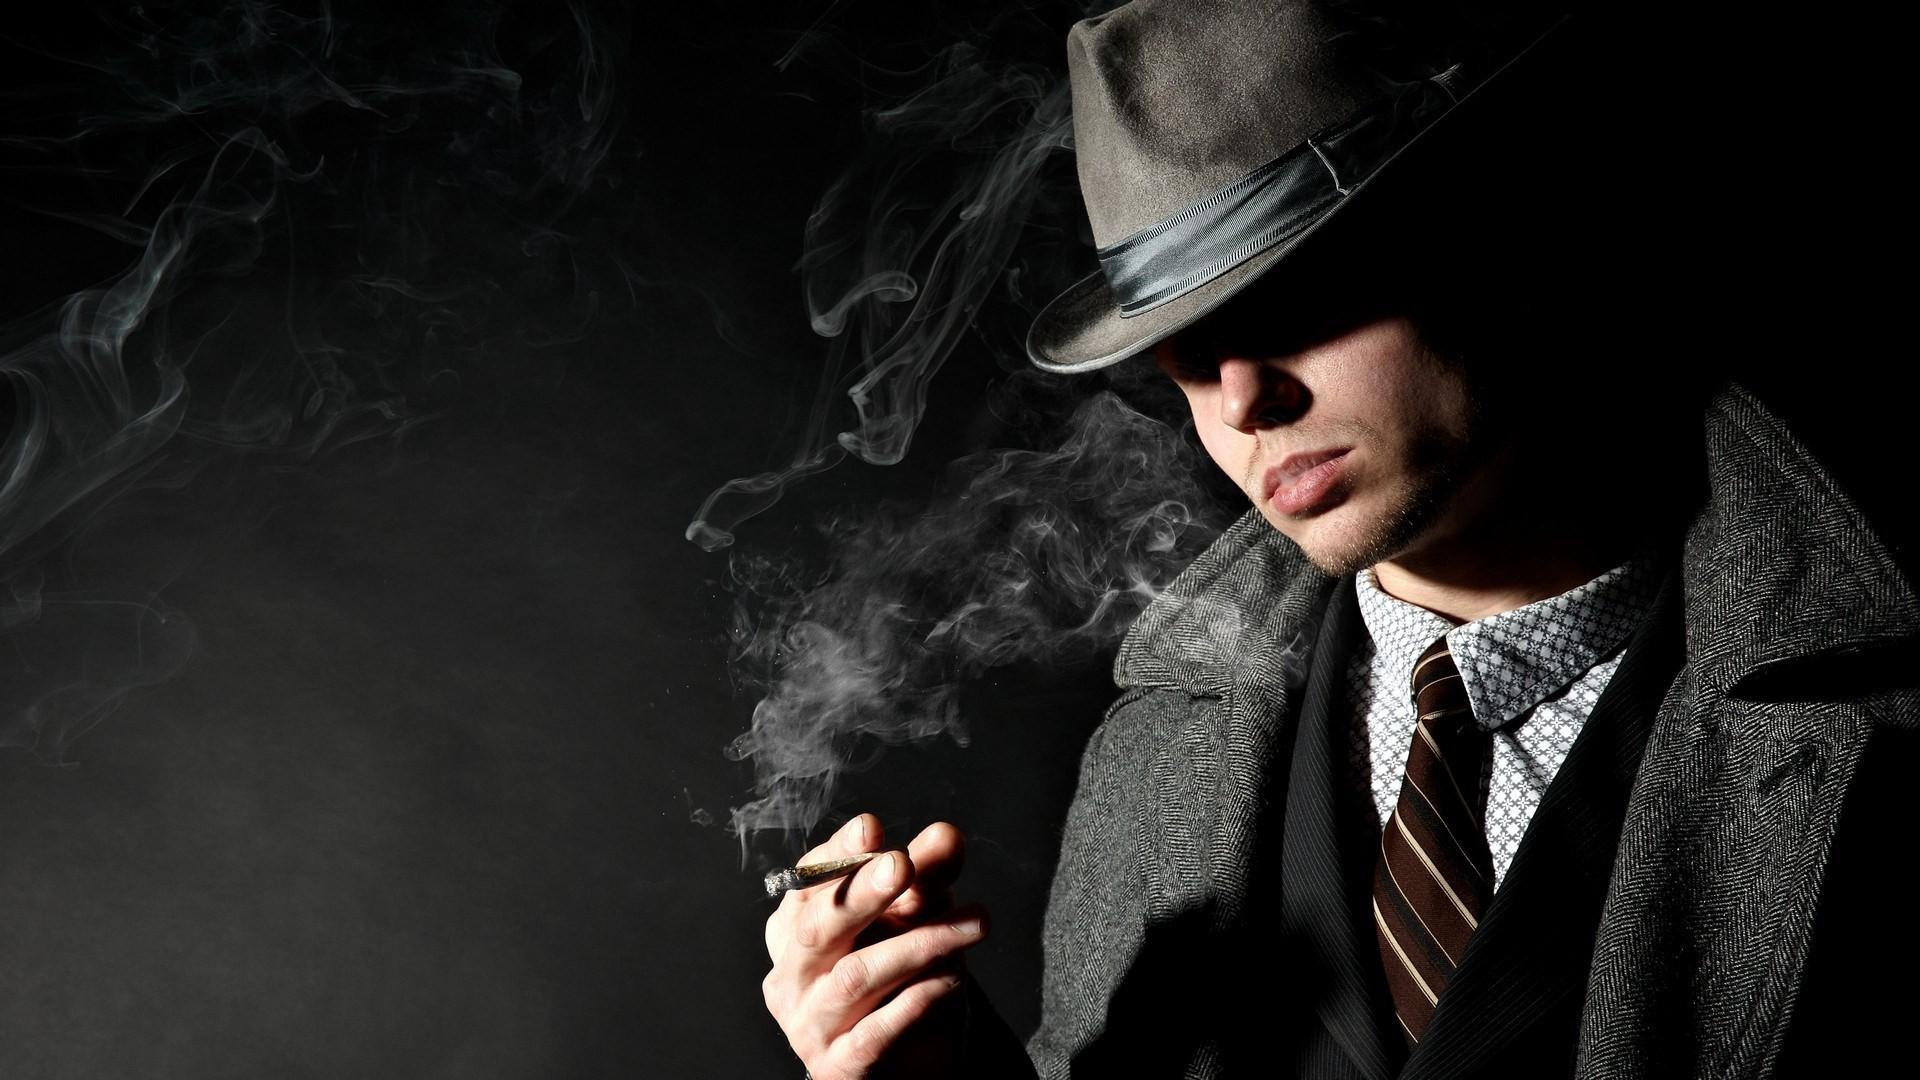 gangster desktop wallpaper hd pics